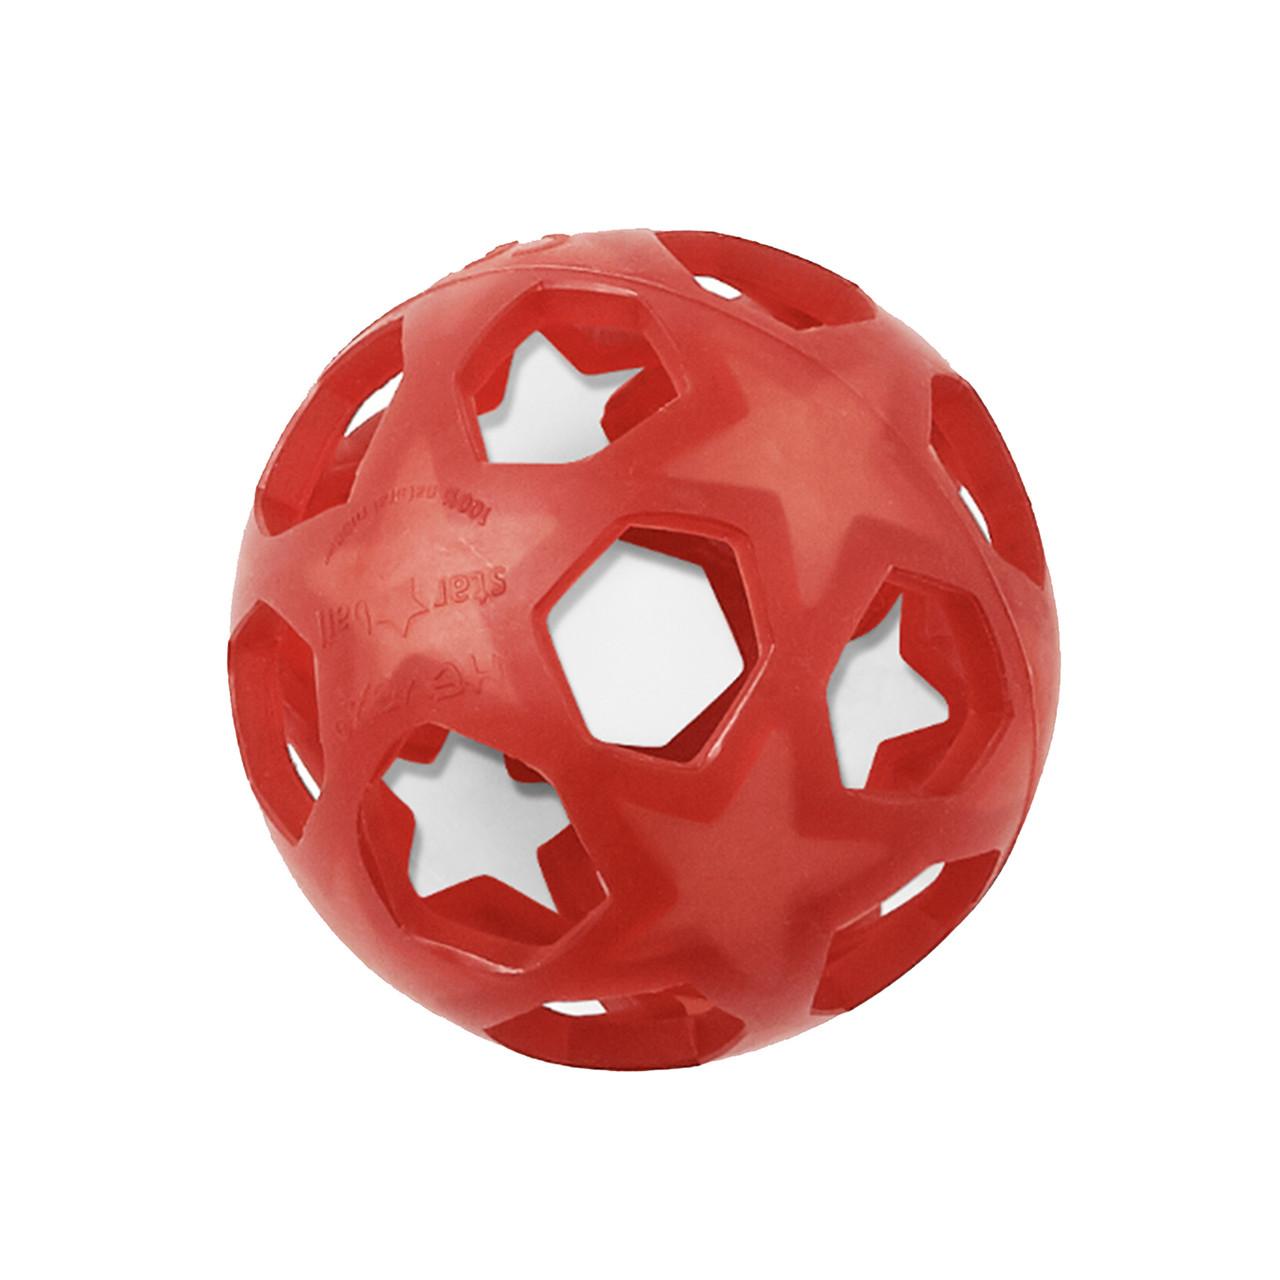 HEVEA - Игрушка-прорезыватель Star Ball Red